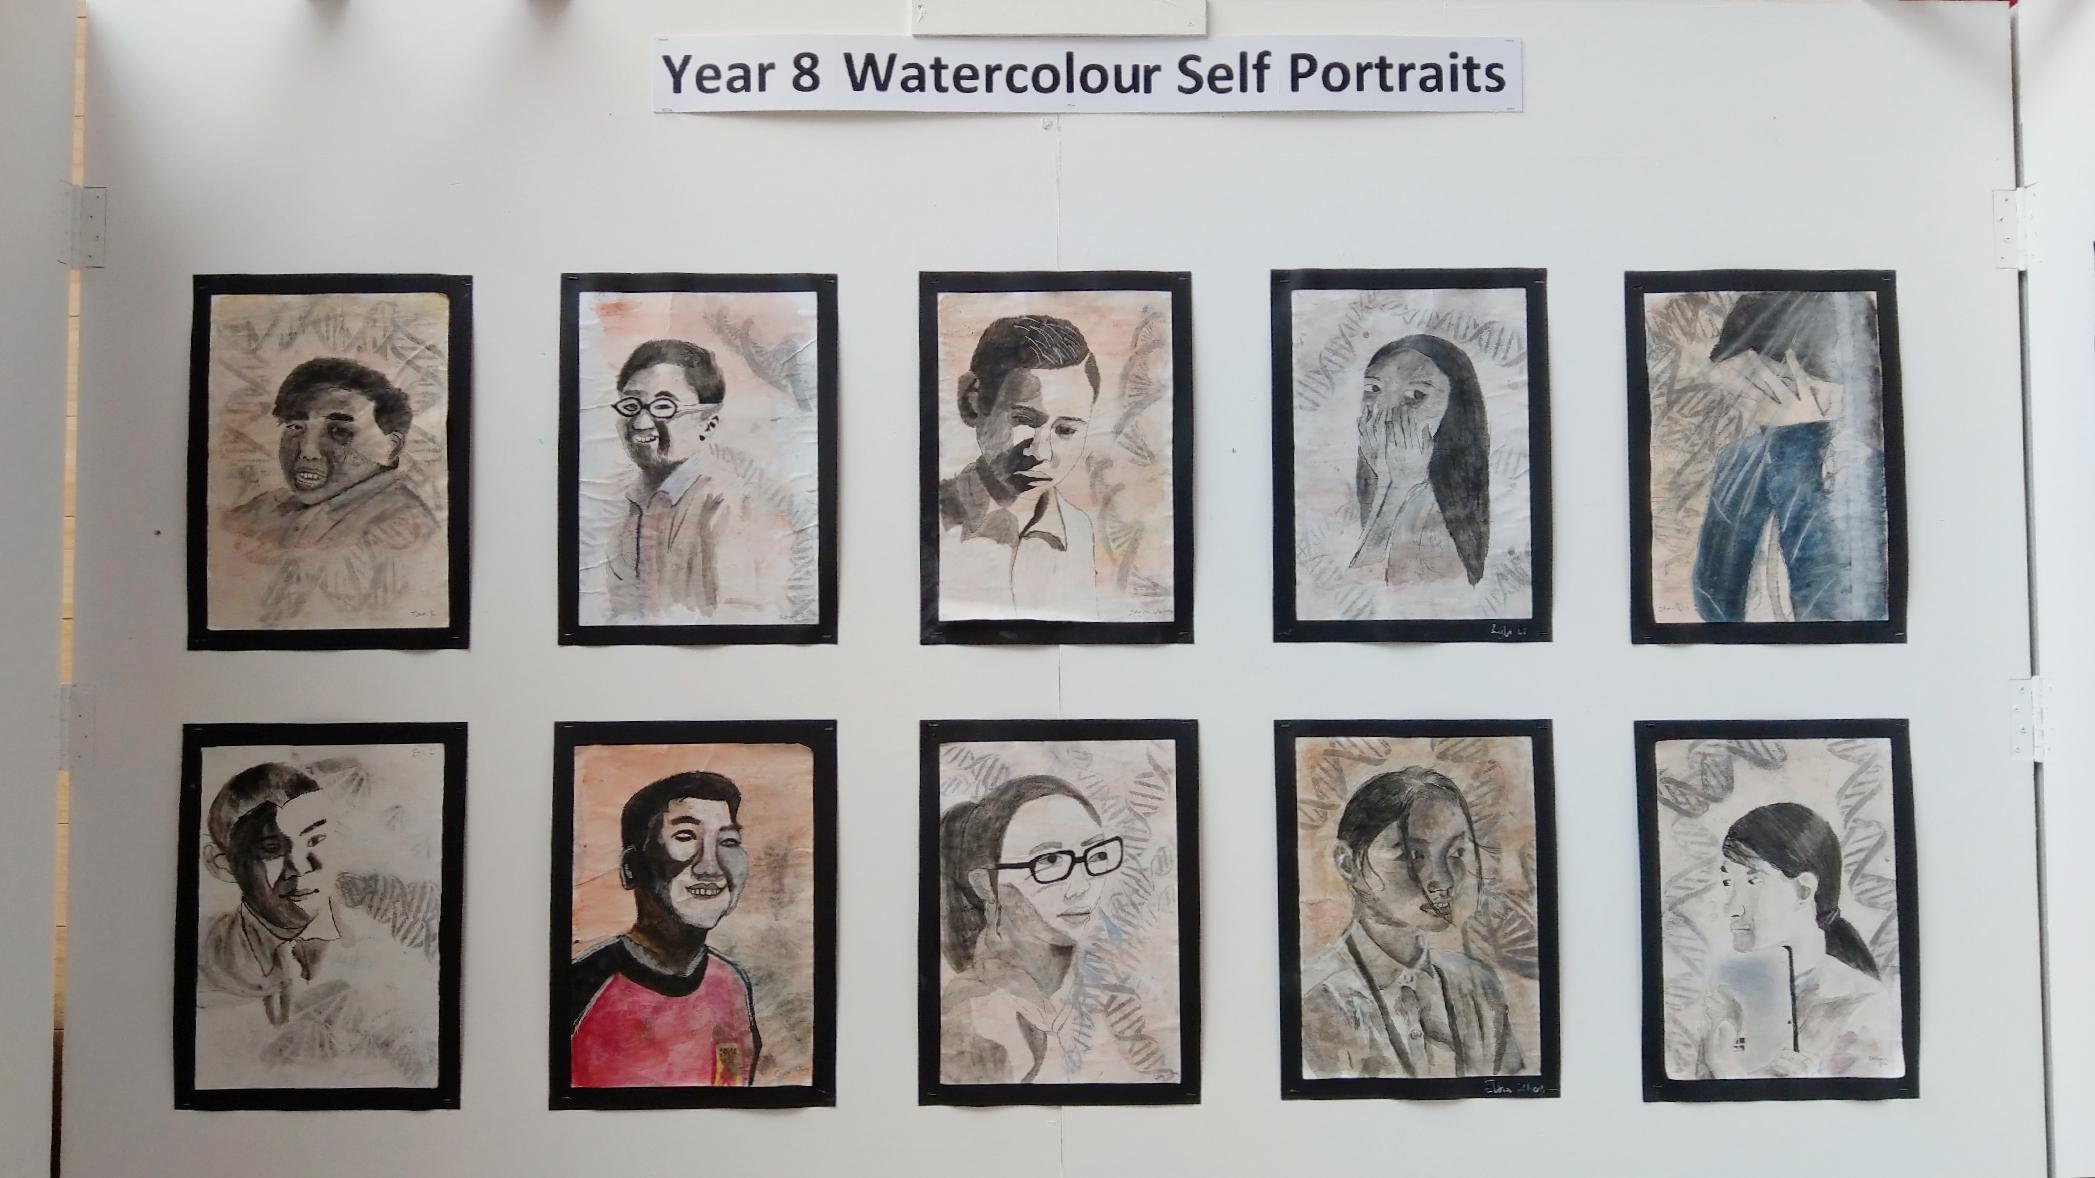 year-8-water-color-self-portraits-北京德威英国国际学校